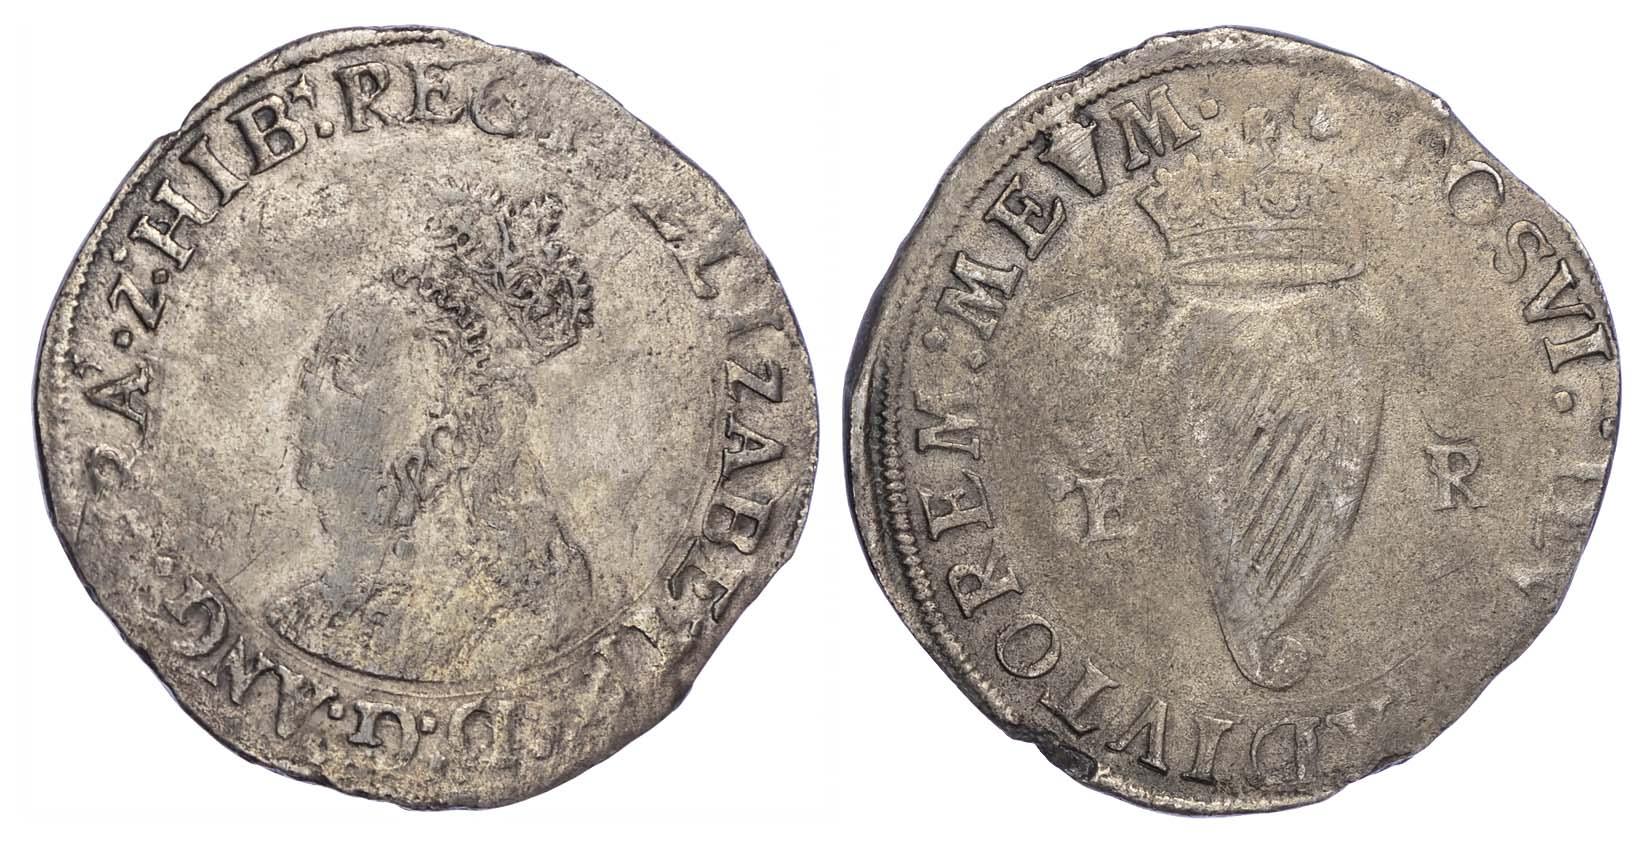 Ireland Elizabeth I (1558-1603), Shilling, 1558, 'REGI' Legend